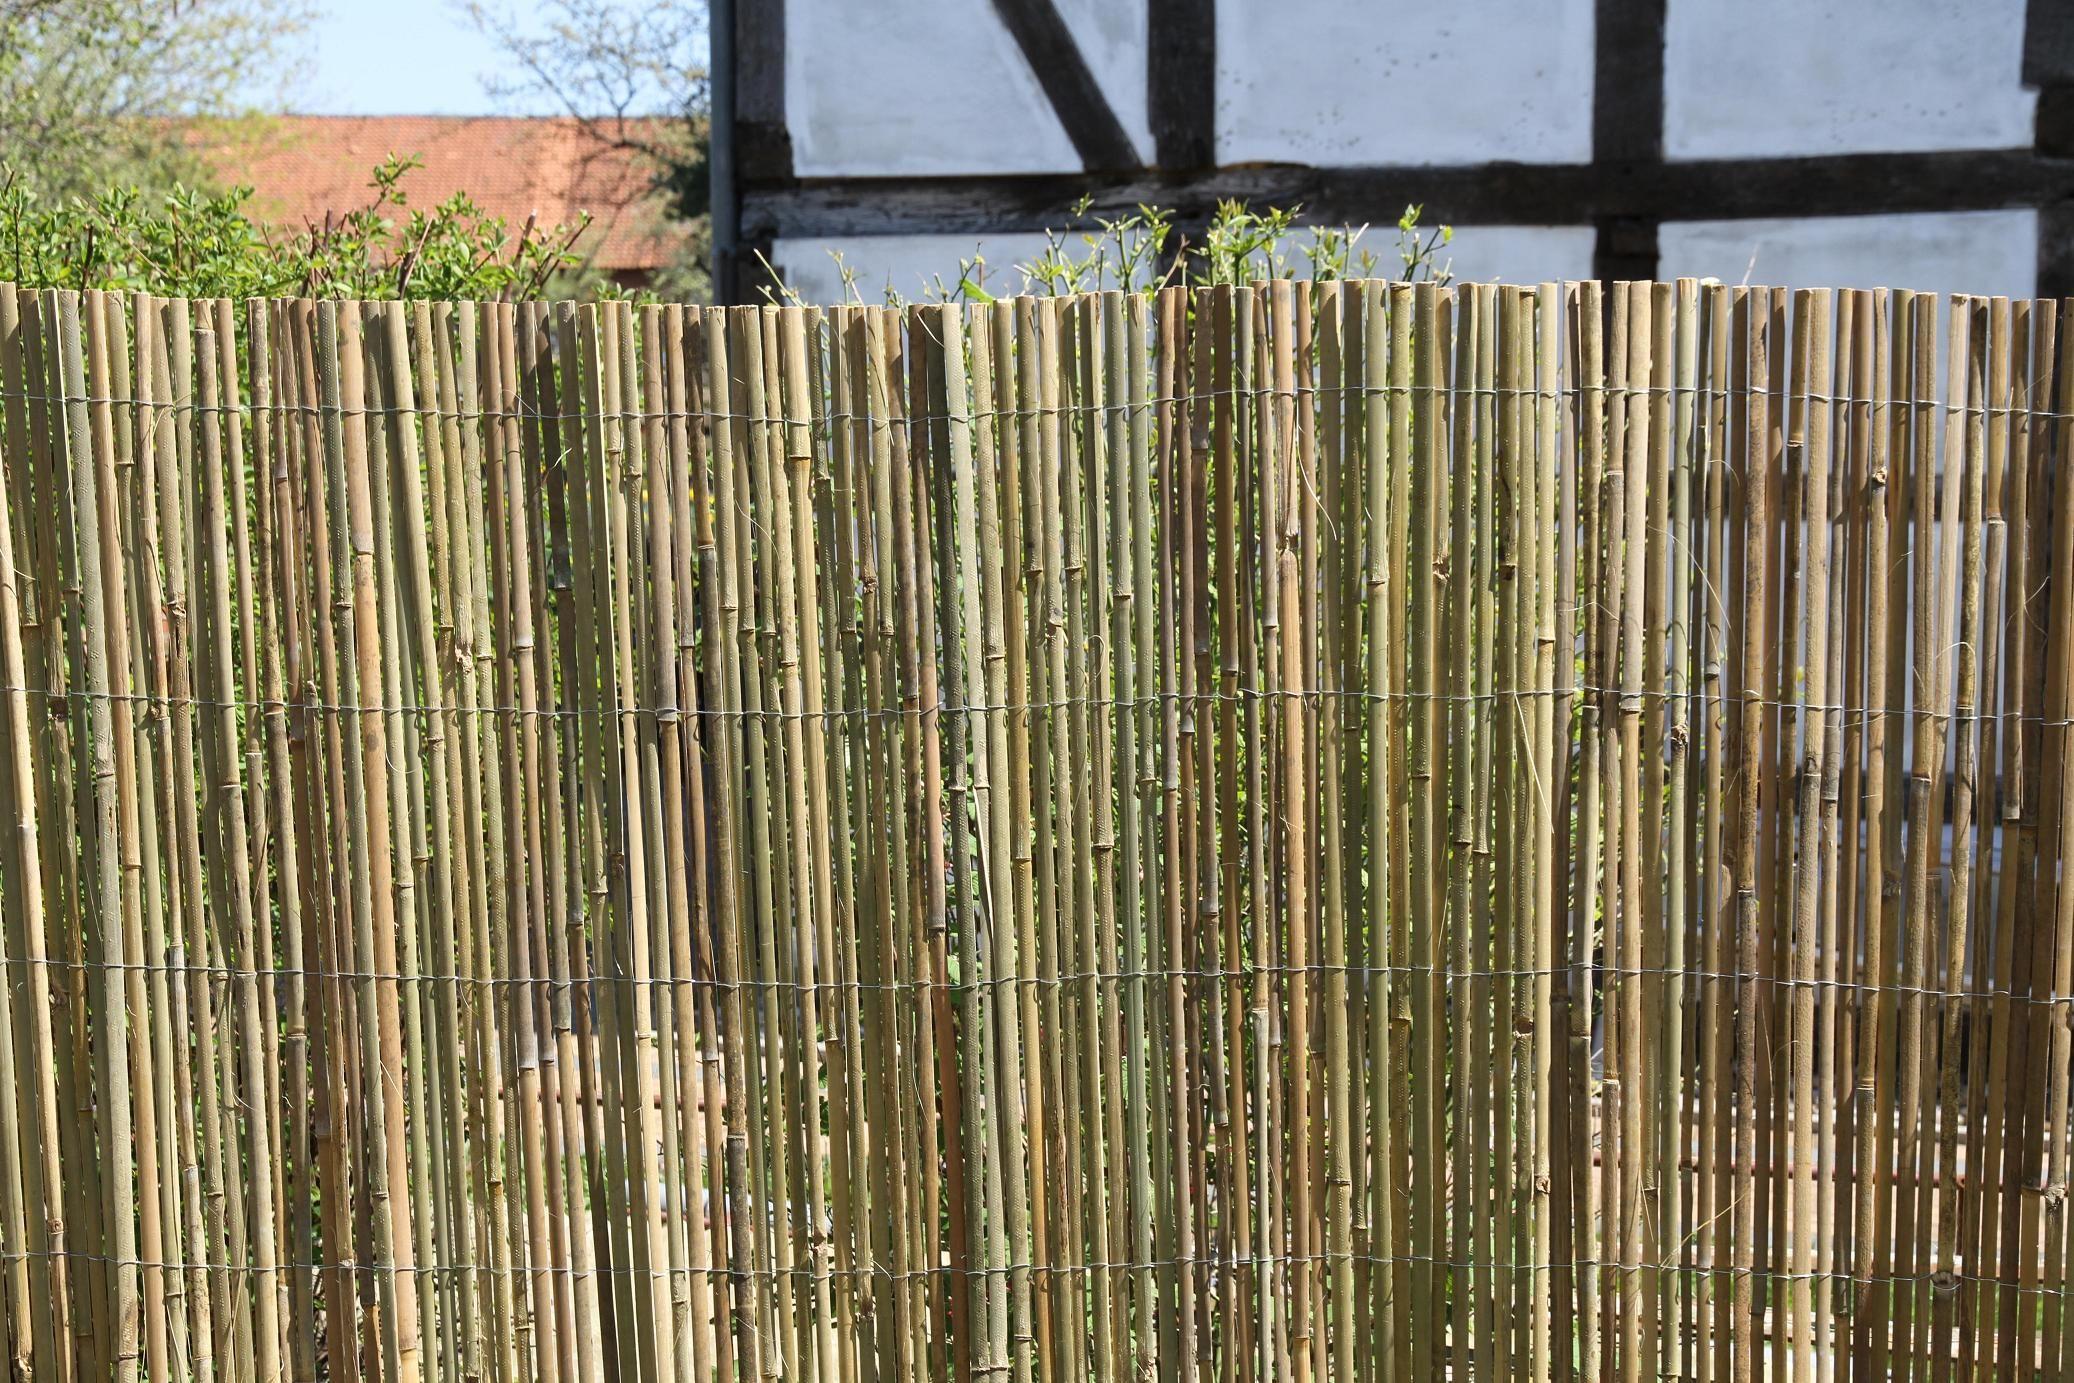 BAMBUSMATTE geschnitten Als Sichtschutz oder Raumteilungselement